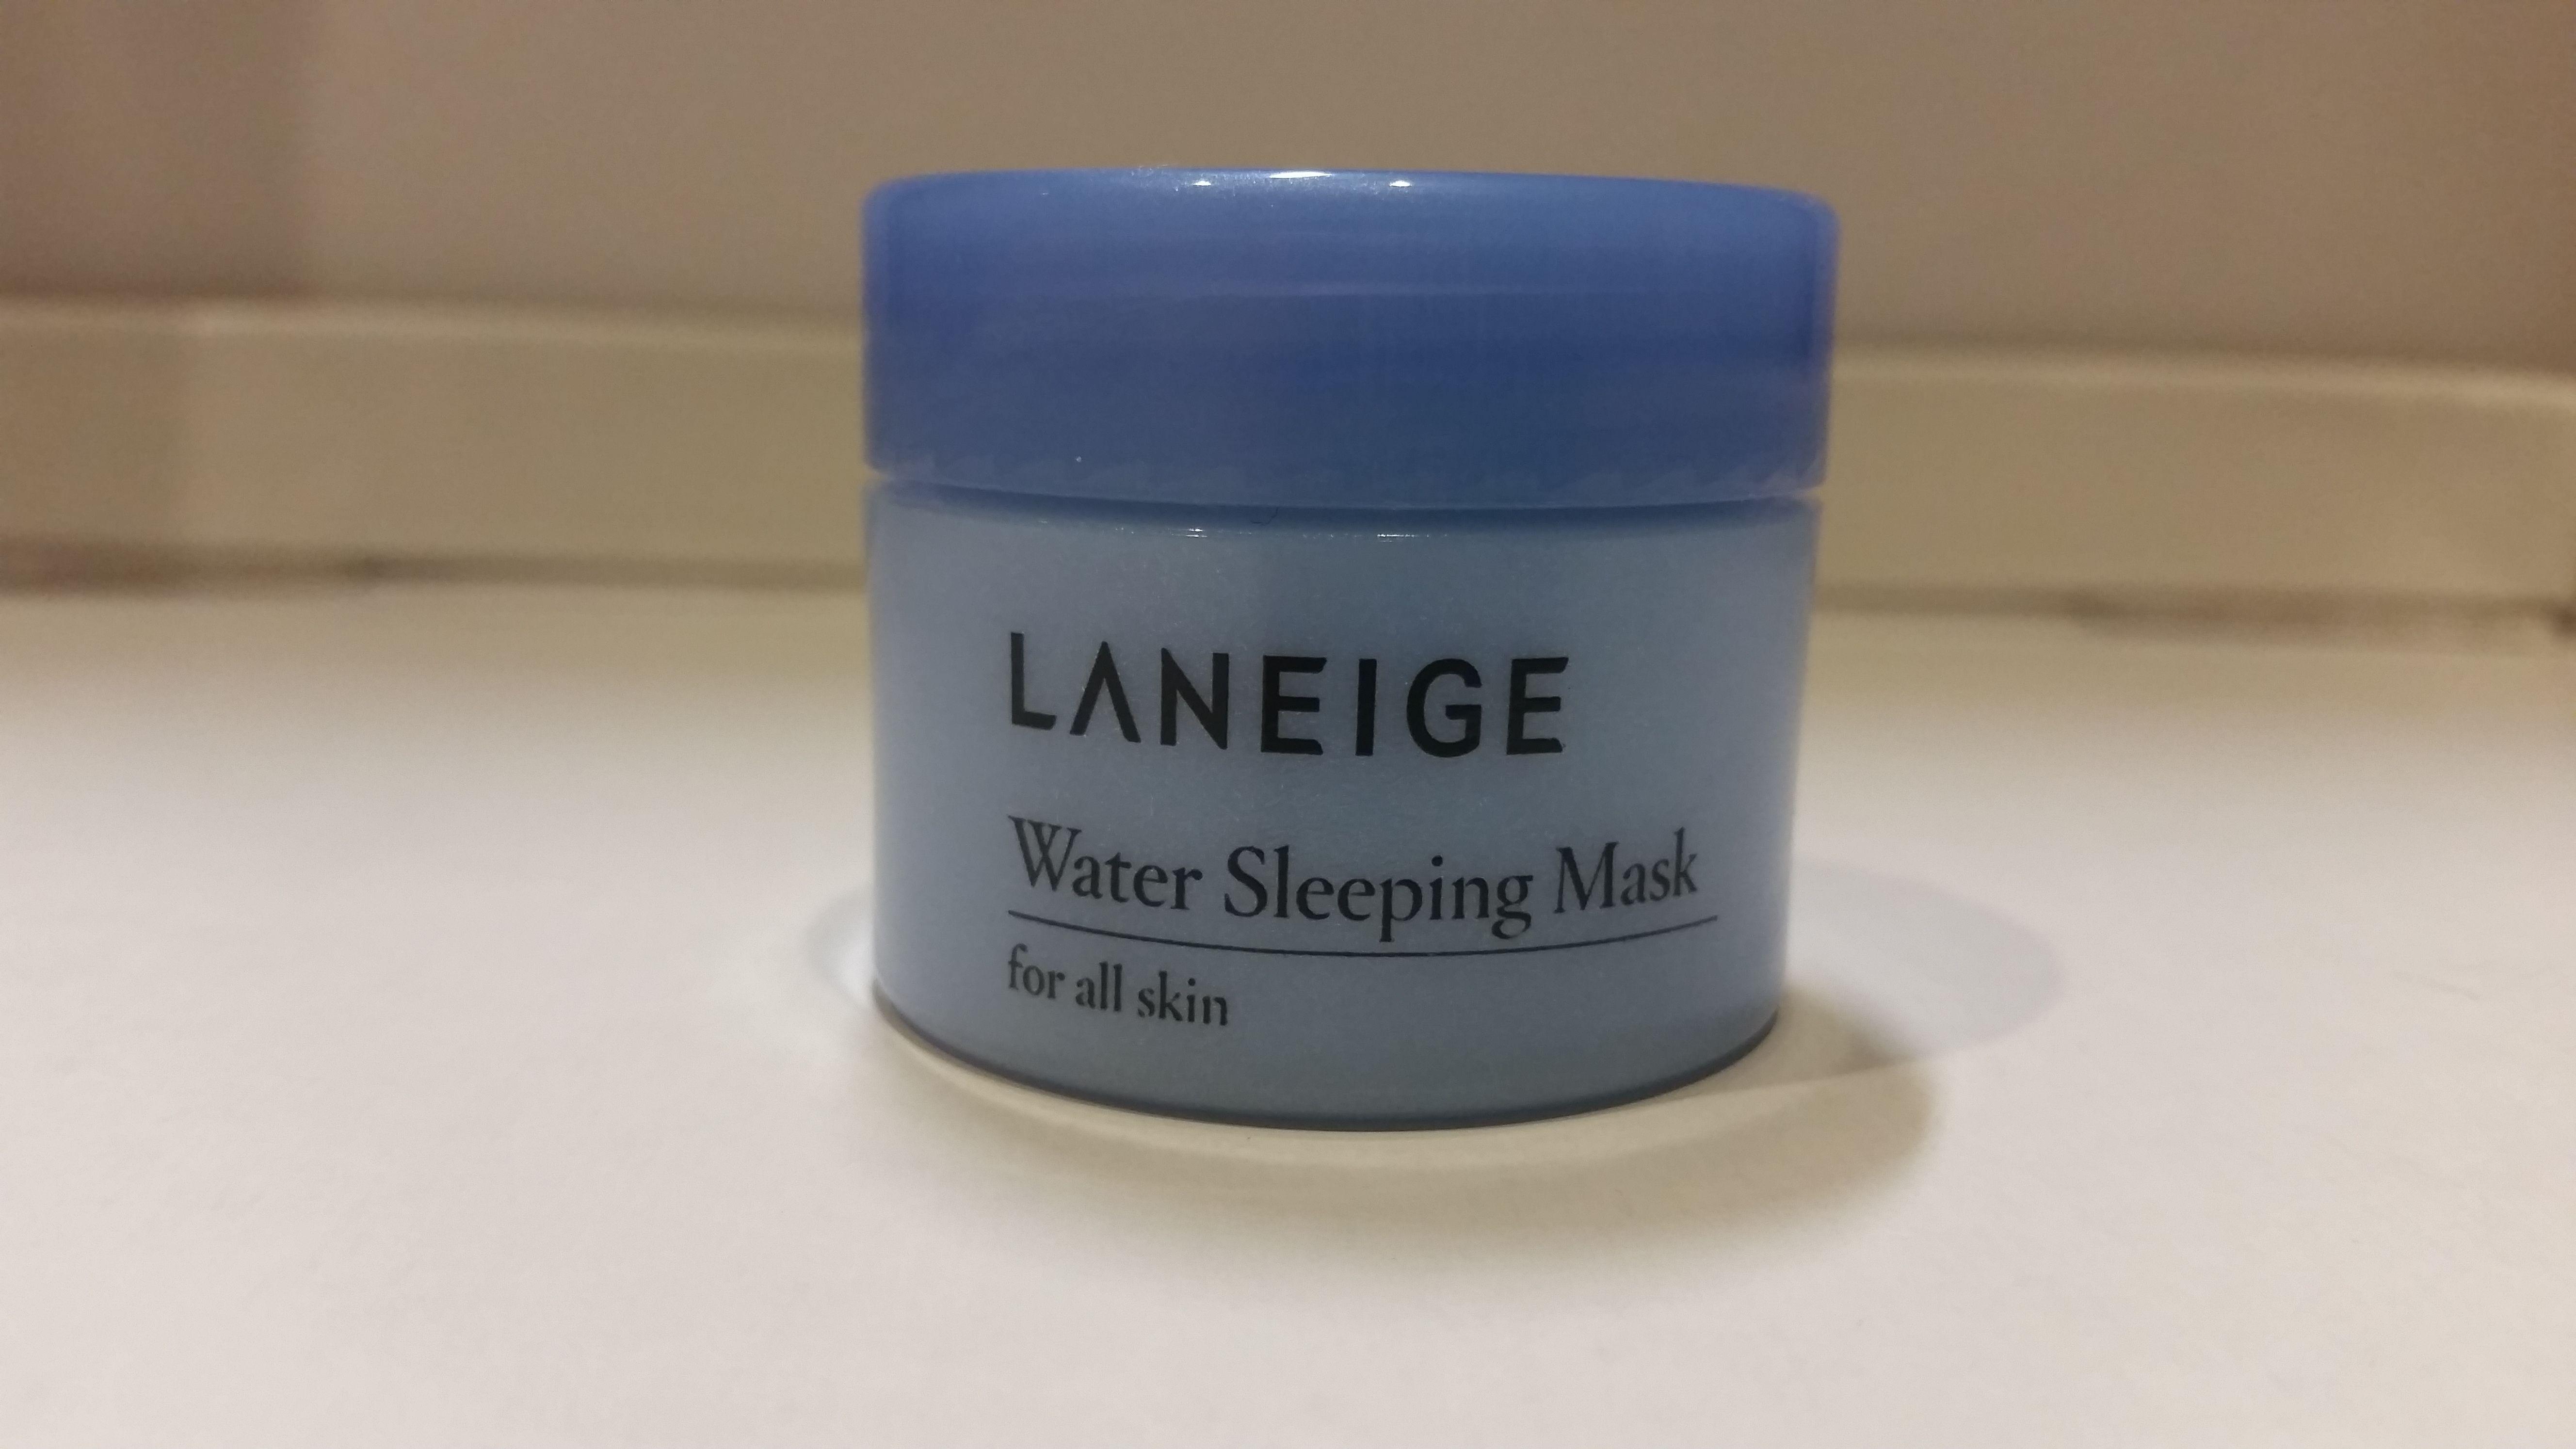 Laneige Water Sleeping Mask In Trial Size My Moisturizers Lip Travel